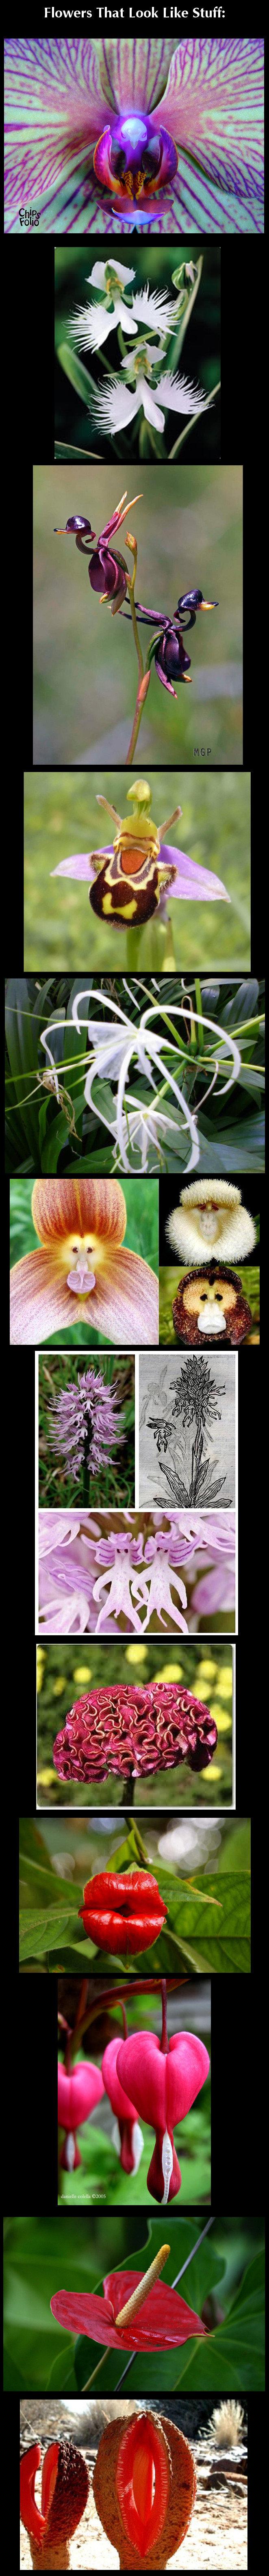 All Natural. . Flowers That Look Like Stuff: a, , tgat Ili